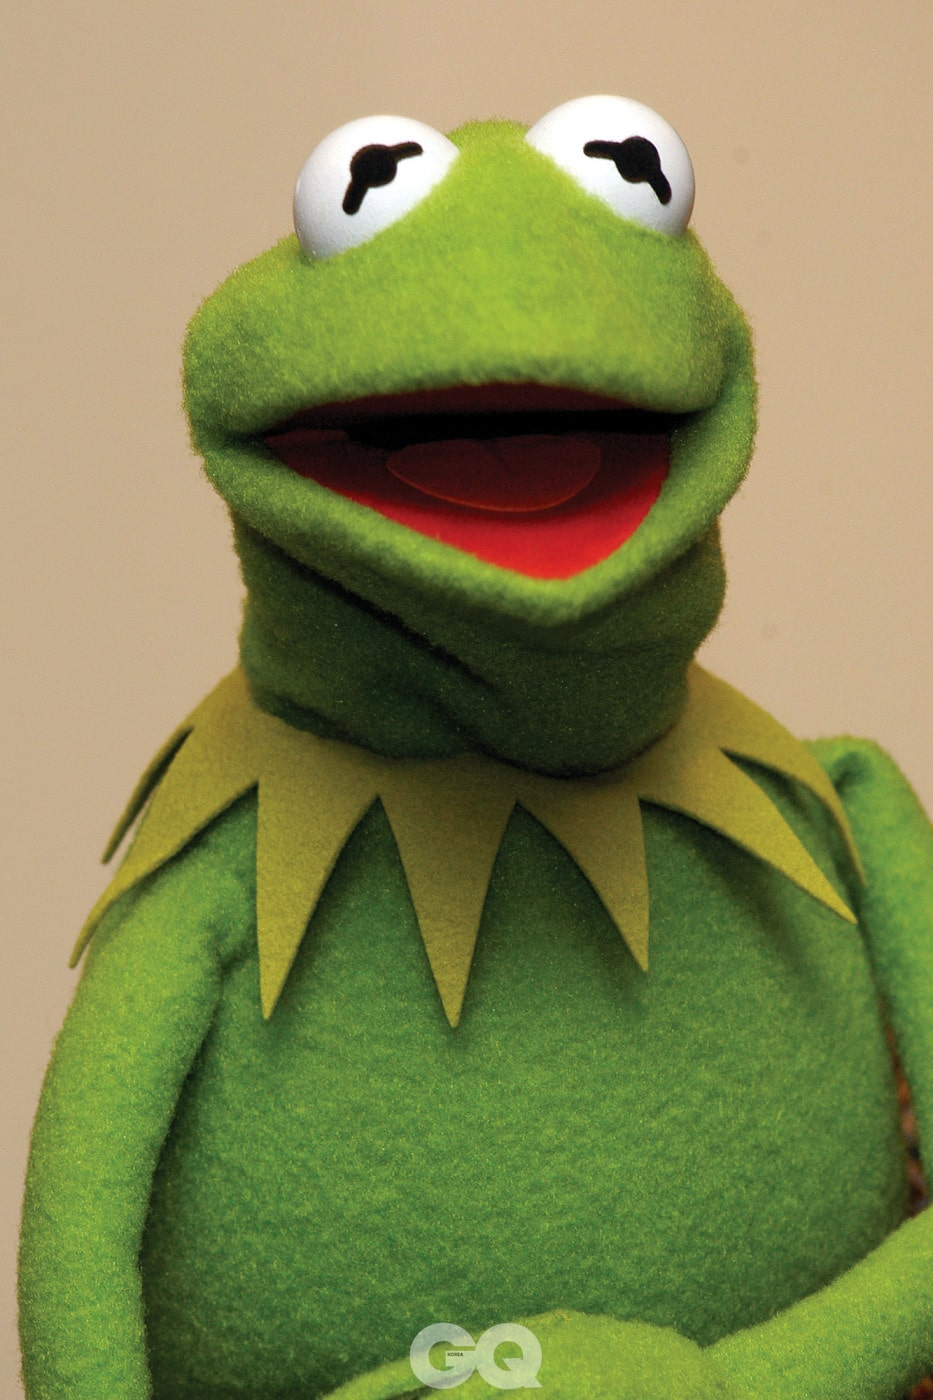 출신 개구리 캐릭터 커밋.